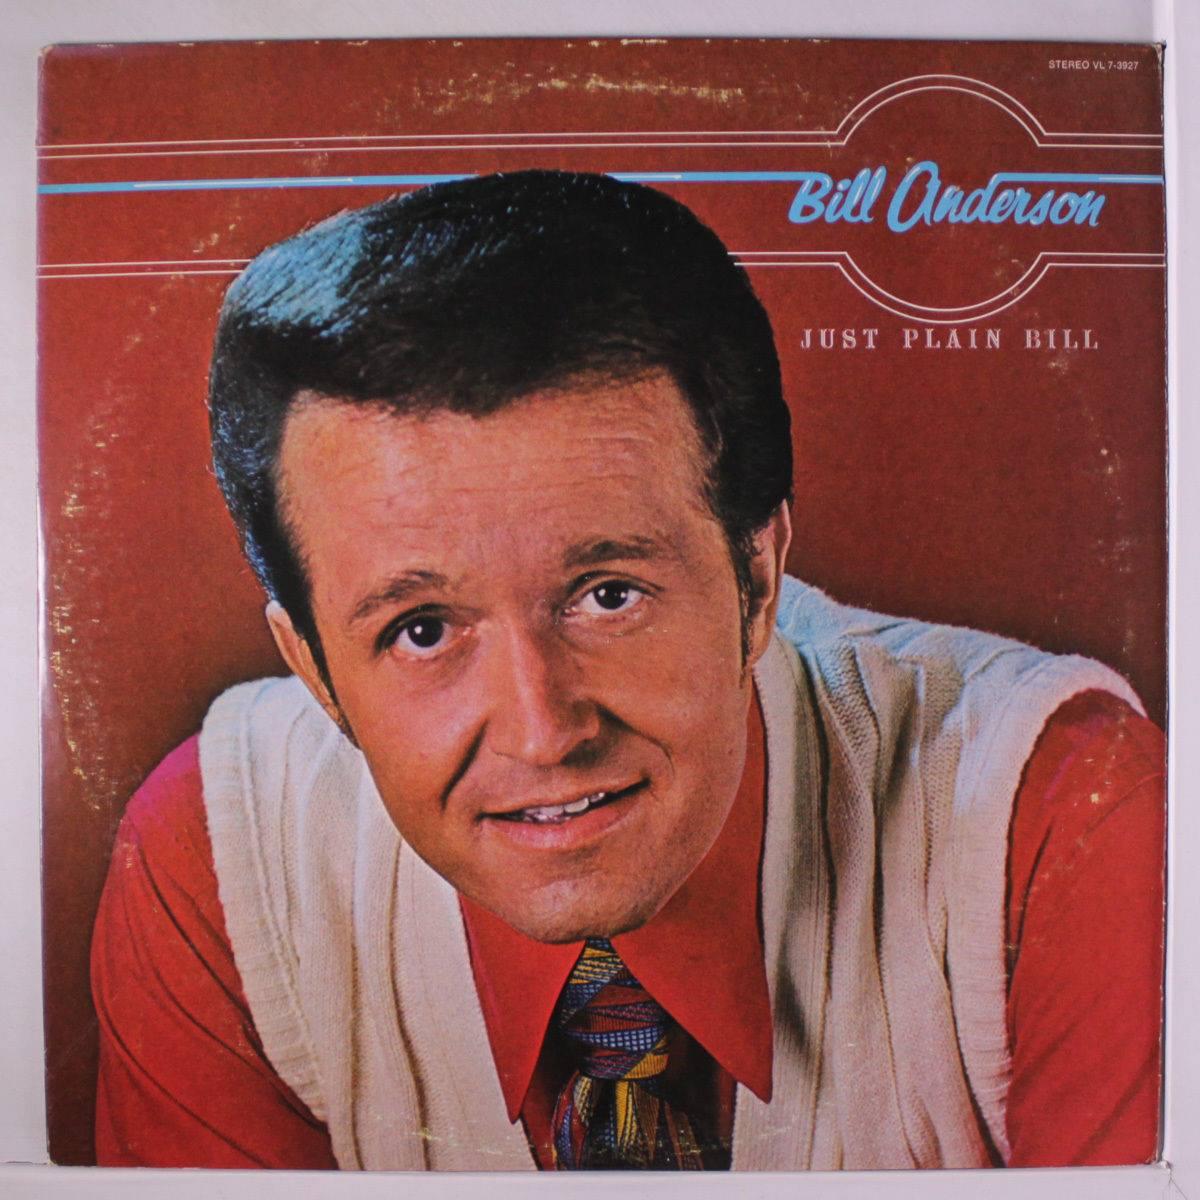 bill_anderson just_plain_bill